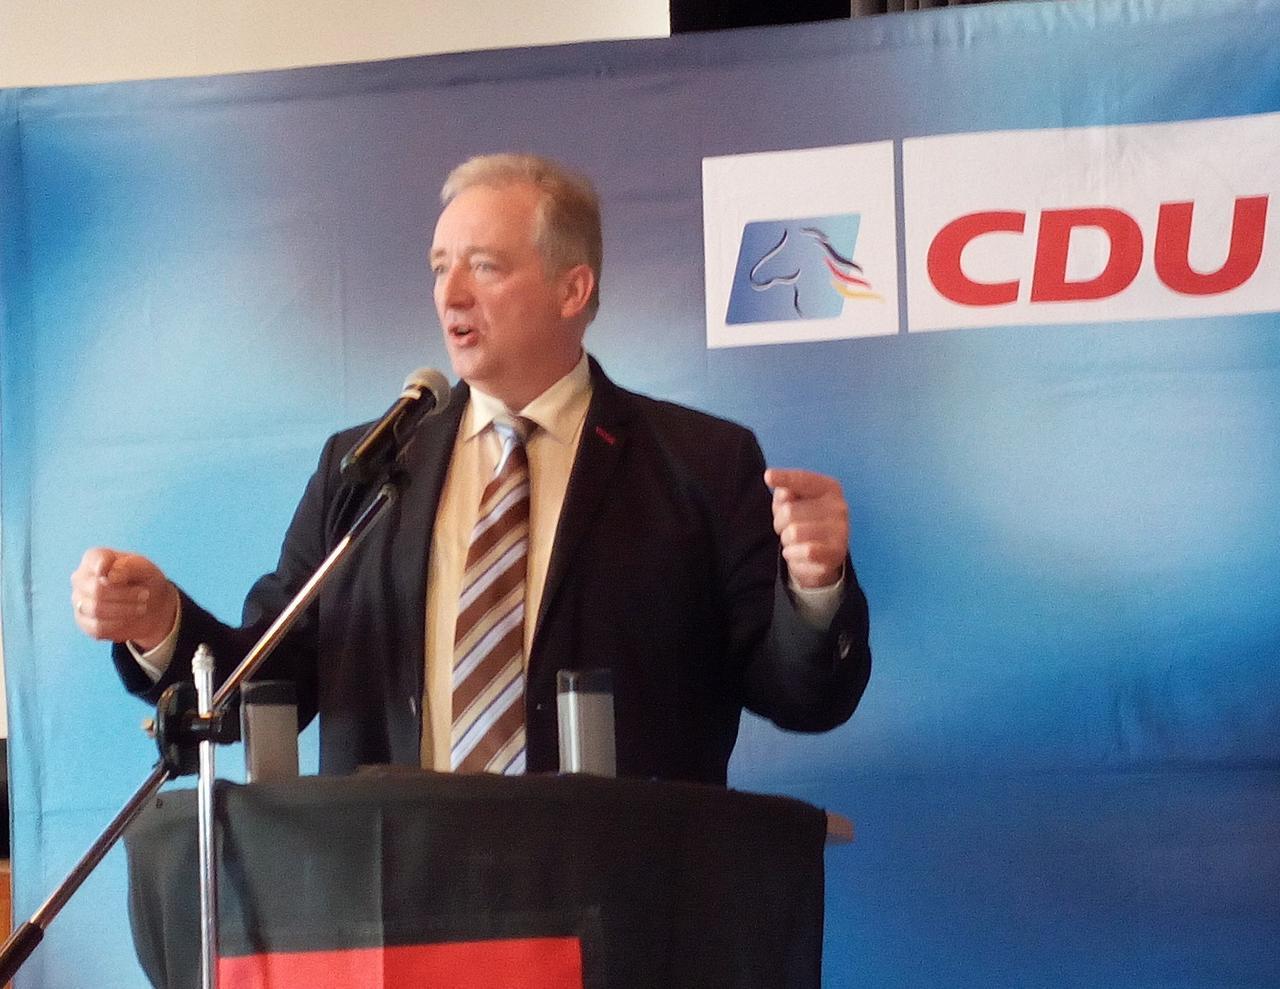 Oesterhelweg bleibt Kreisvorsitzender